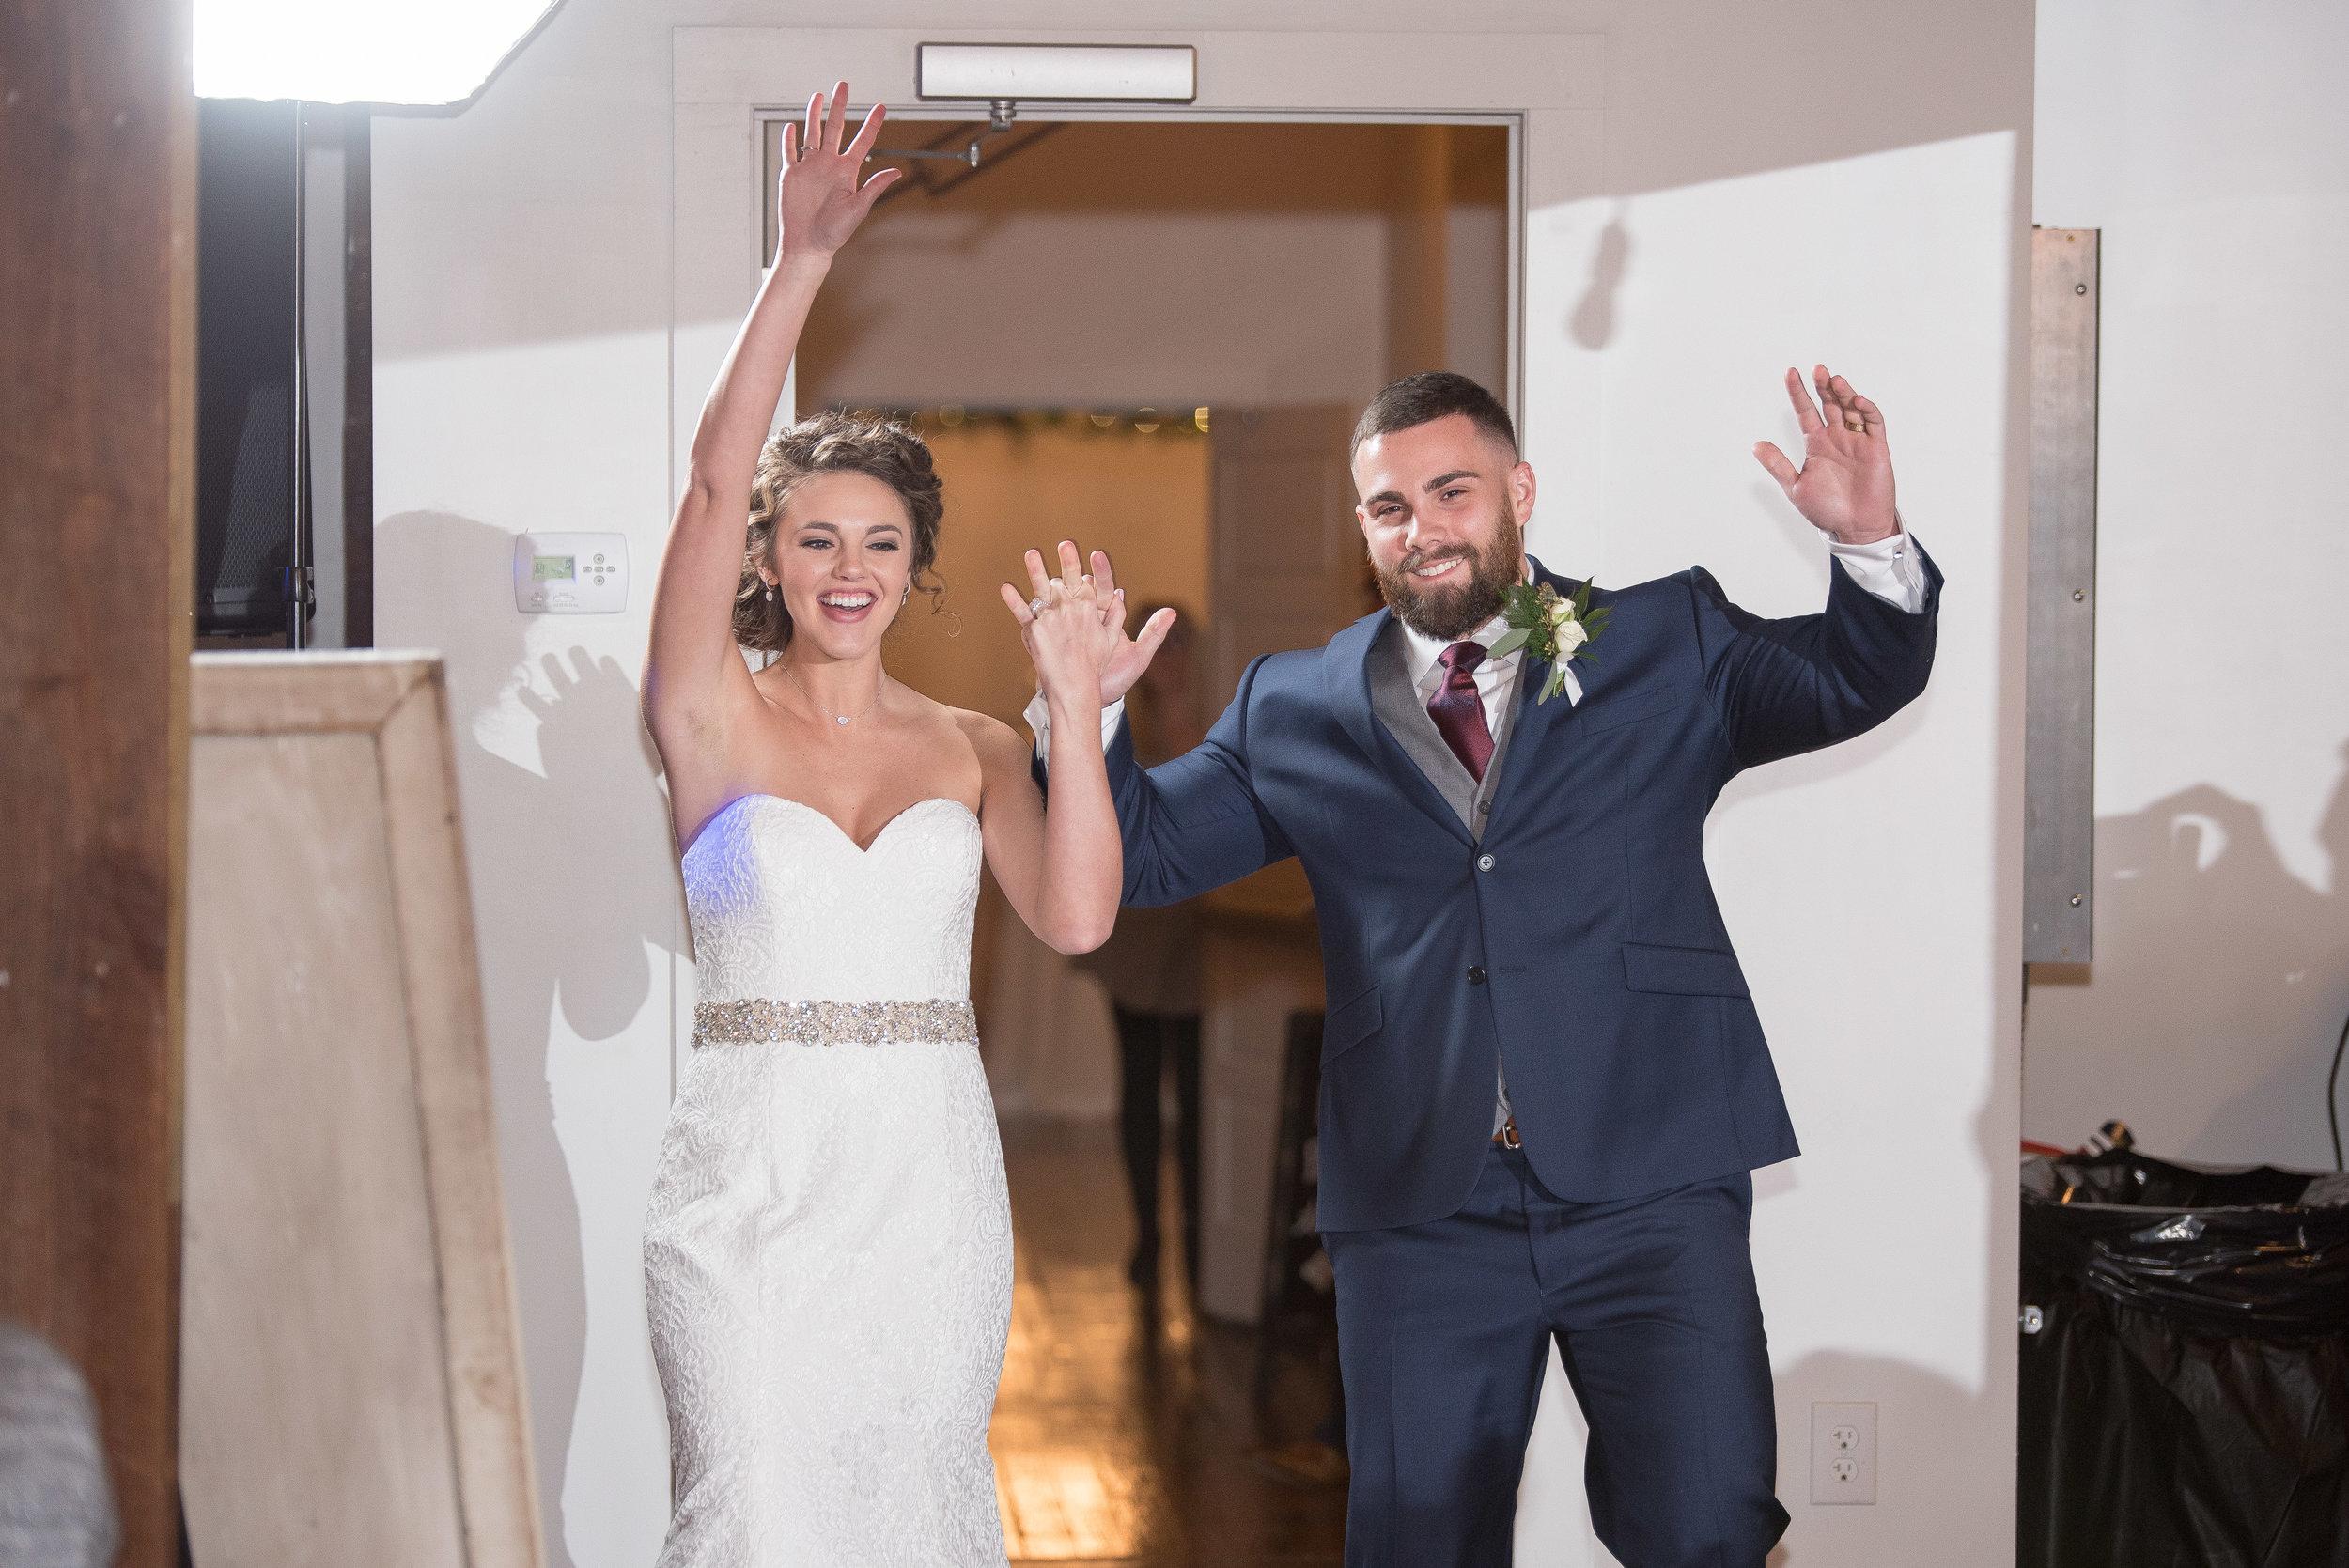 The Roller Mill Events - Winston Salem Weddings - NC Weddings - High Point NC Weddings - Winston Salem Venue - Yasmin Leonard Photography-63.jpg